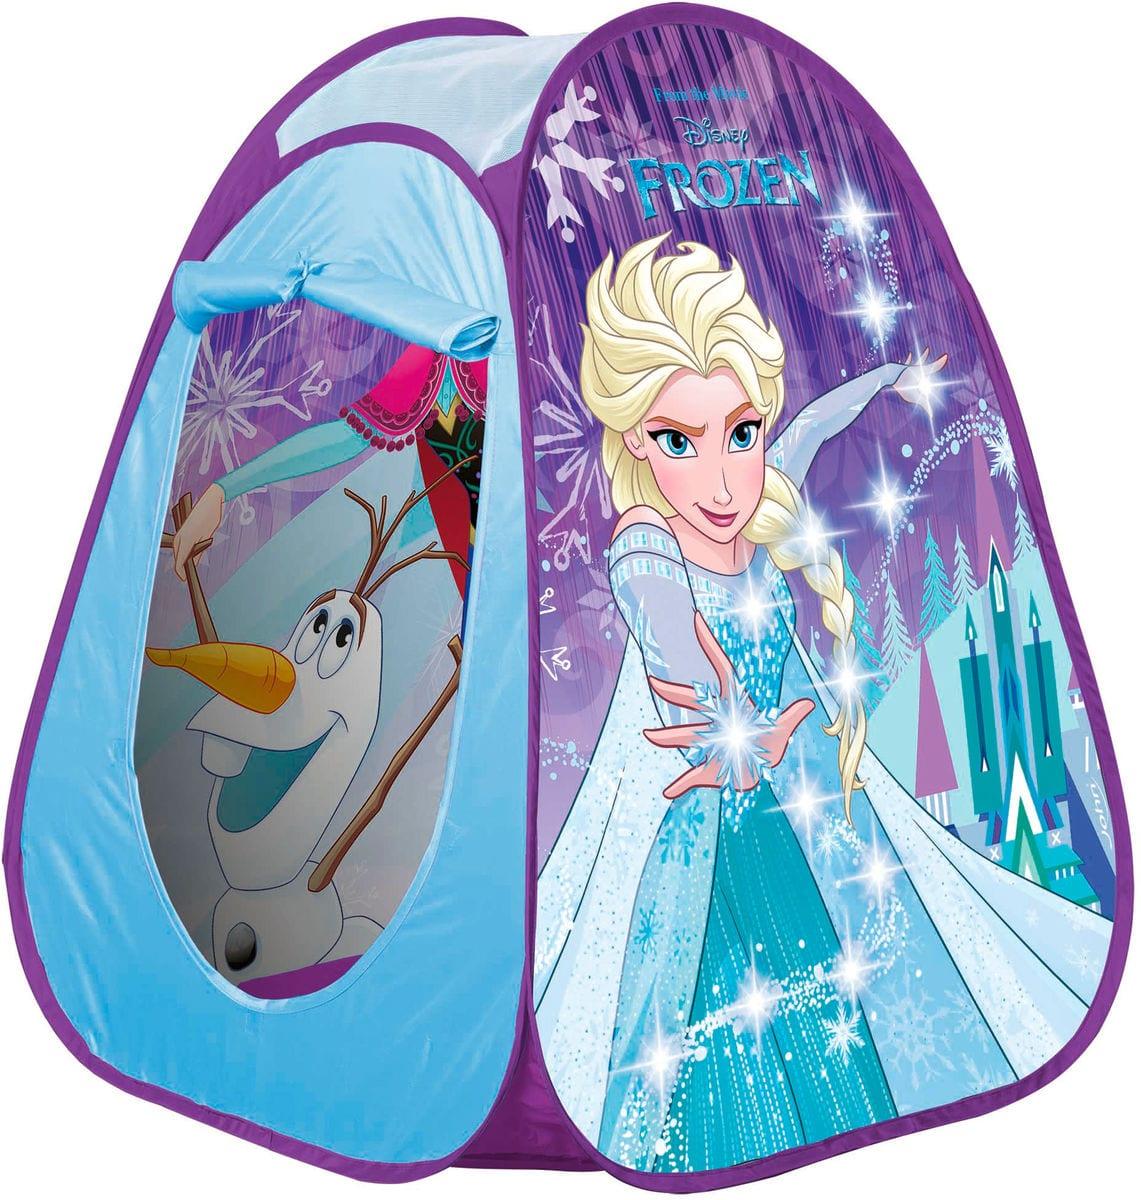 My Pop Up Zelt Frozen 2 Outdoor-Spielzeug